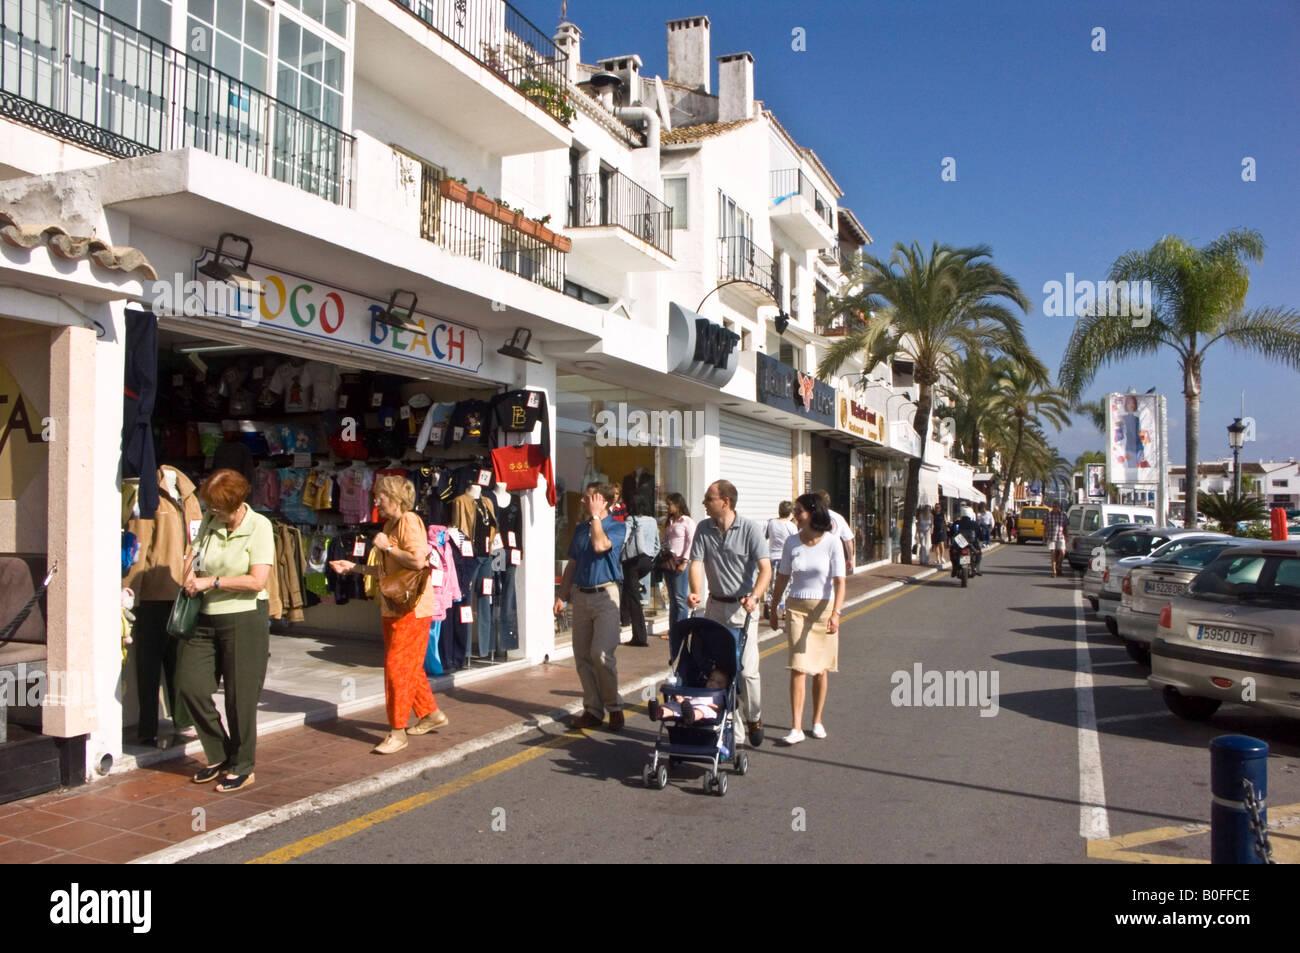 Hotels In Marbella Near Puerto Banus